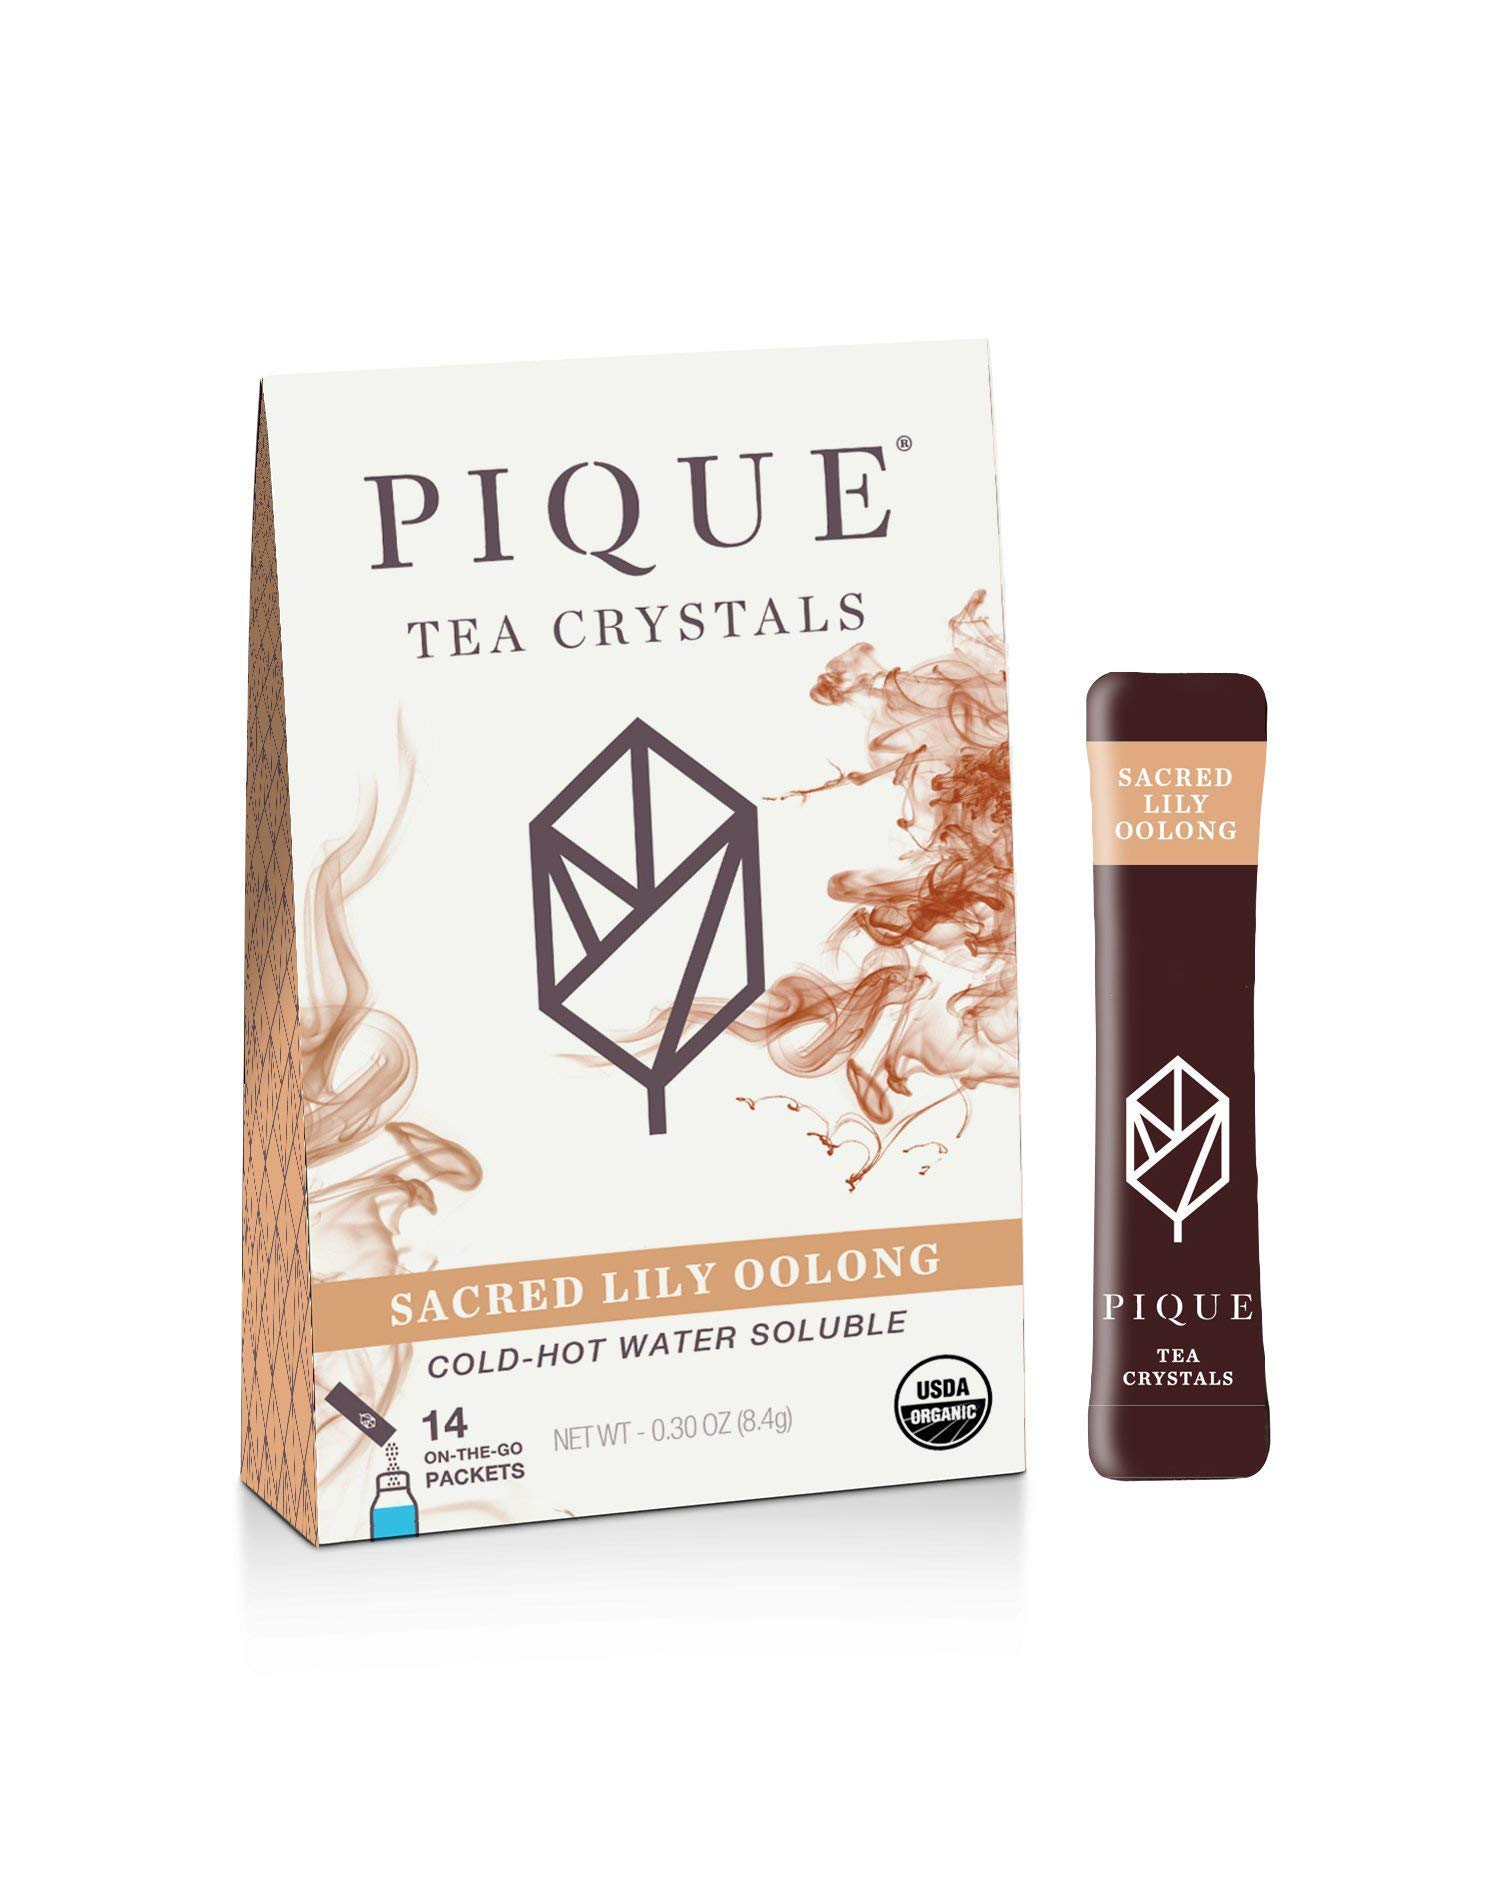 Pique Tea Organic Oolong Tea Crystals - Healthy Metabolism, Immune Support, Healthy Digestion - 1 Pack (14 Sticks)